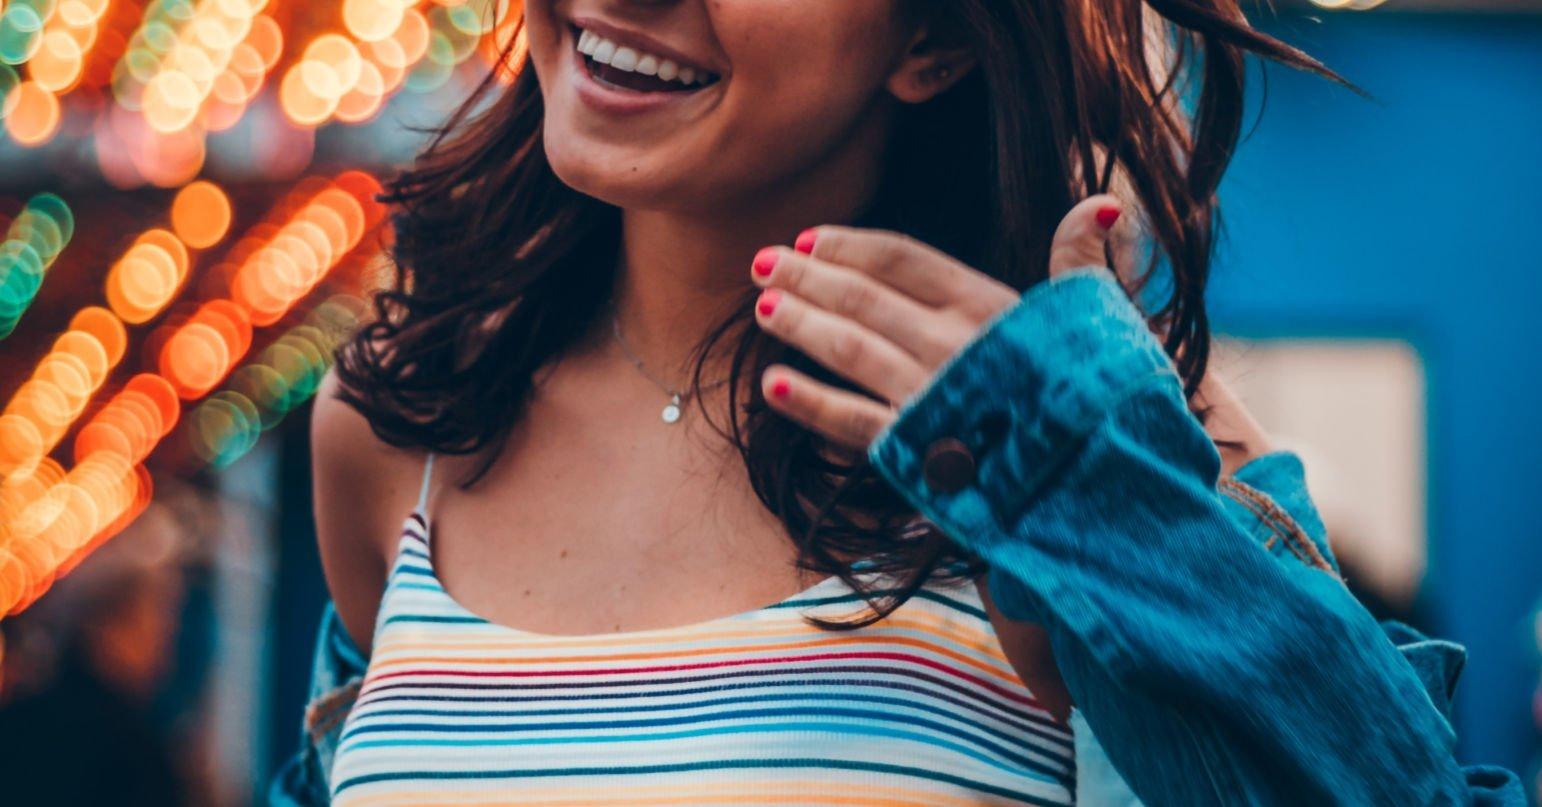 girl smiling in striped top